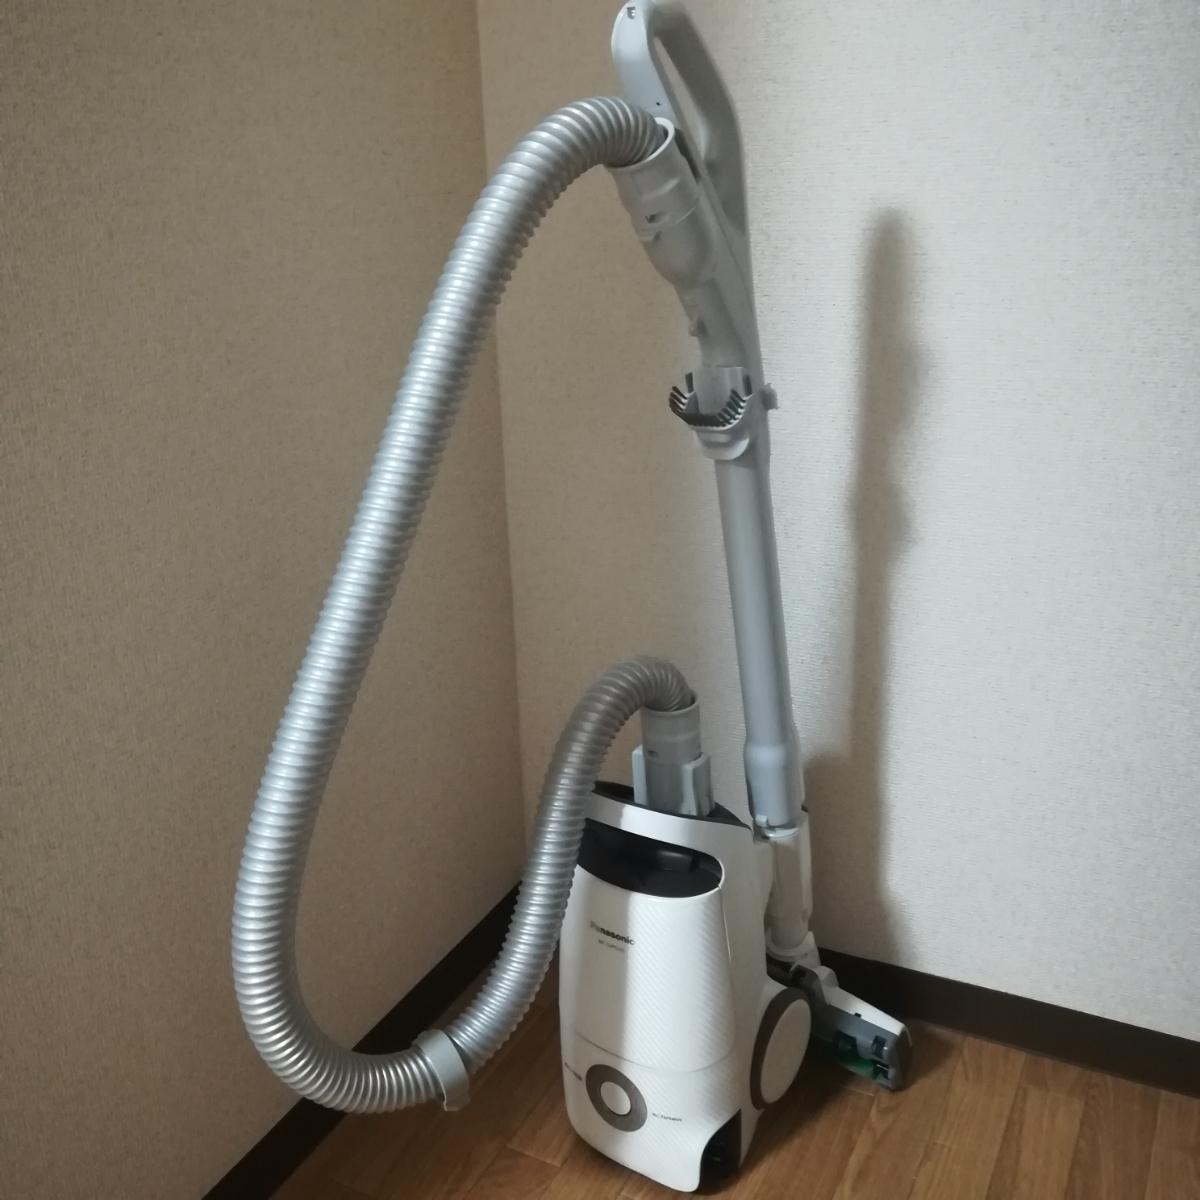 MC-SJP520G パナソニック 掃除機 新品紙パック付 送料無料 美品